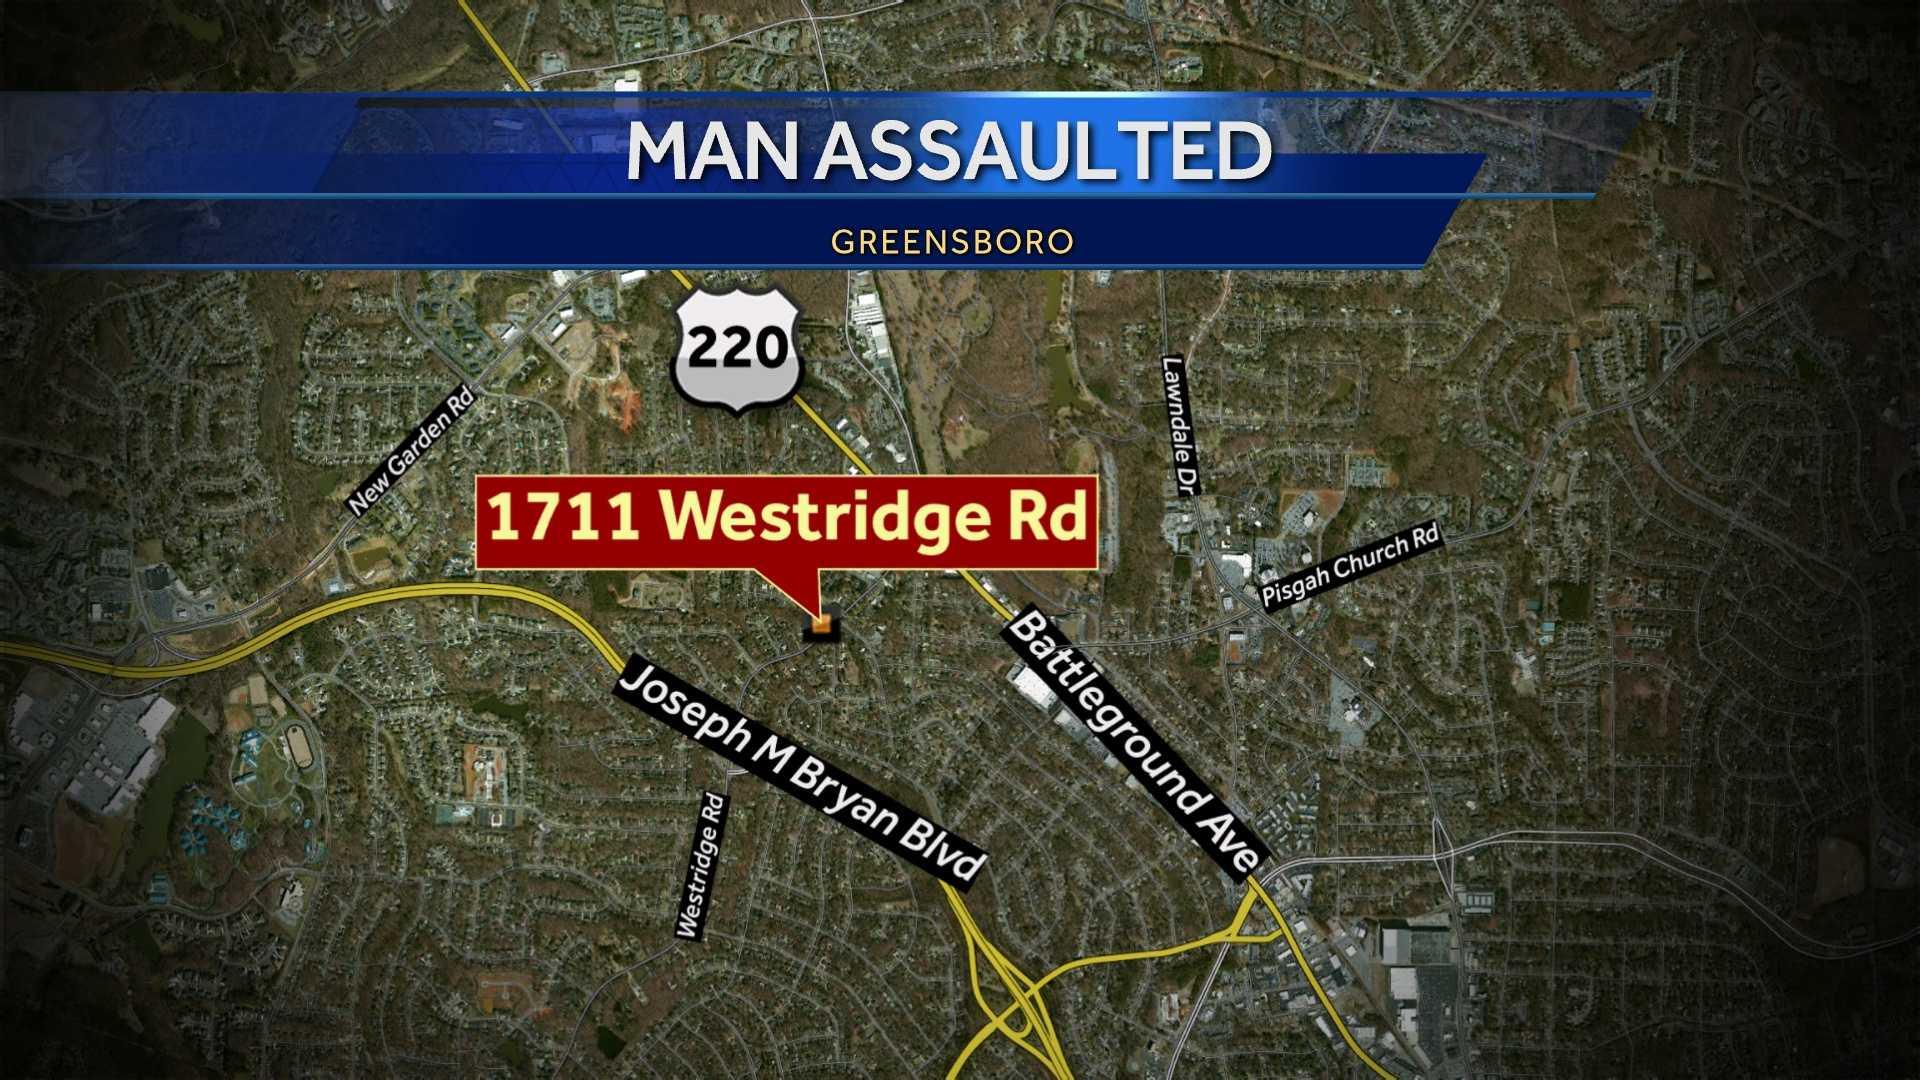 Teen assaulted in Greensboro